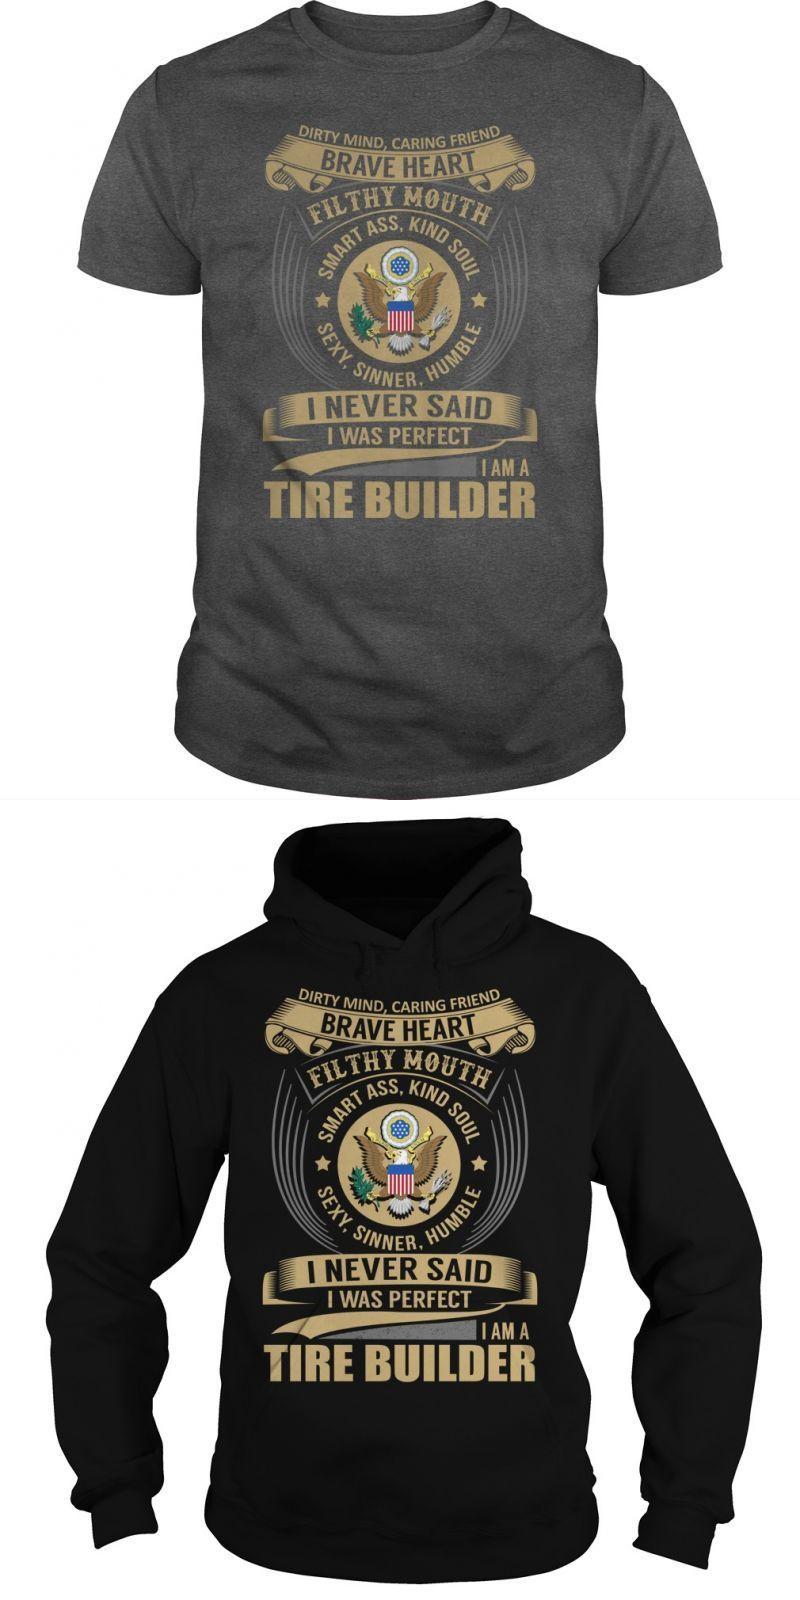 T Shirt Design Generator Online Rldm